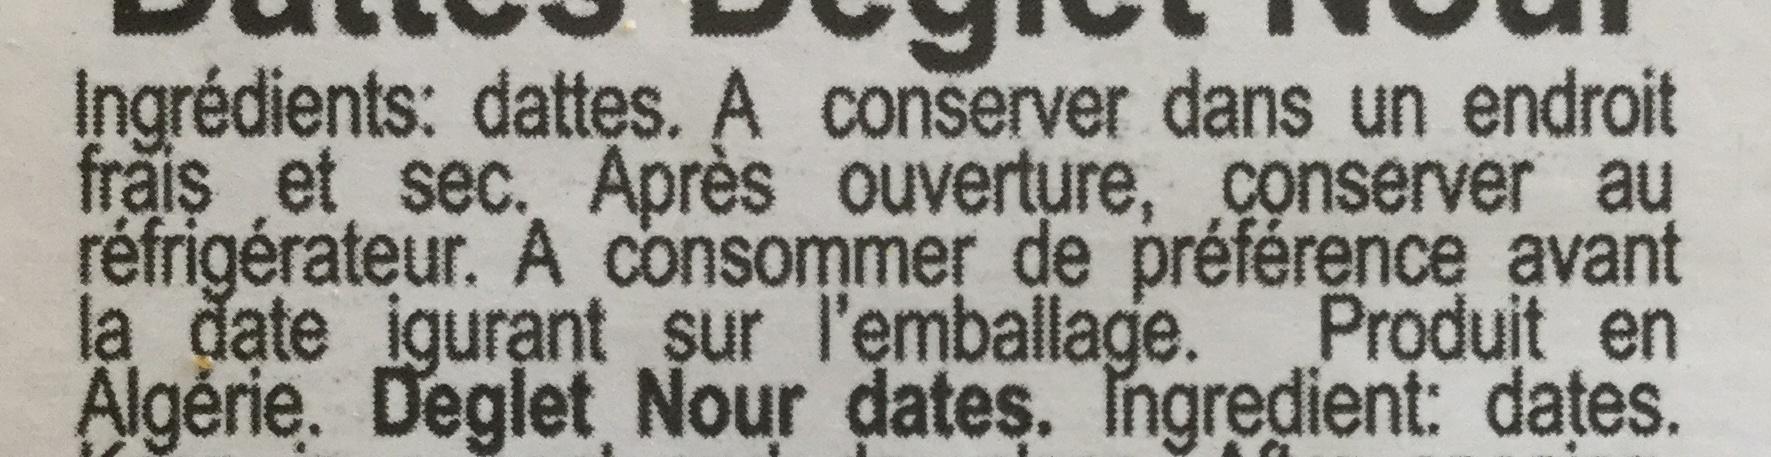 Dattes Deglet Nour - Ingredienti - fr